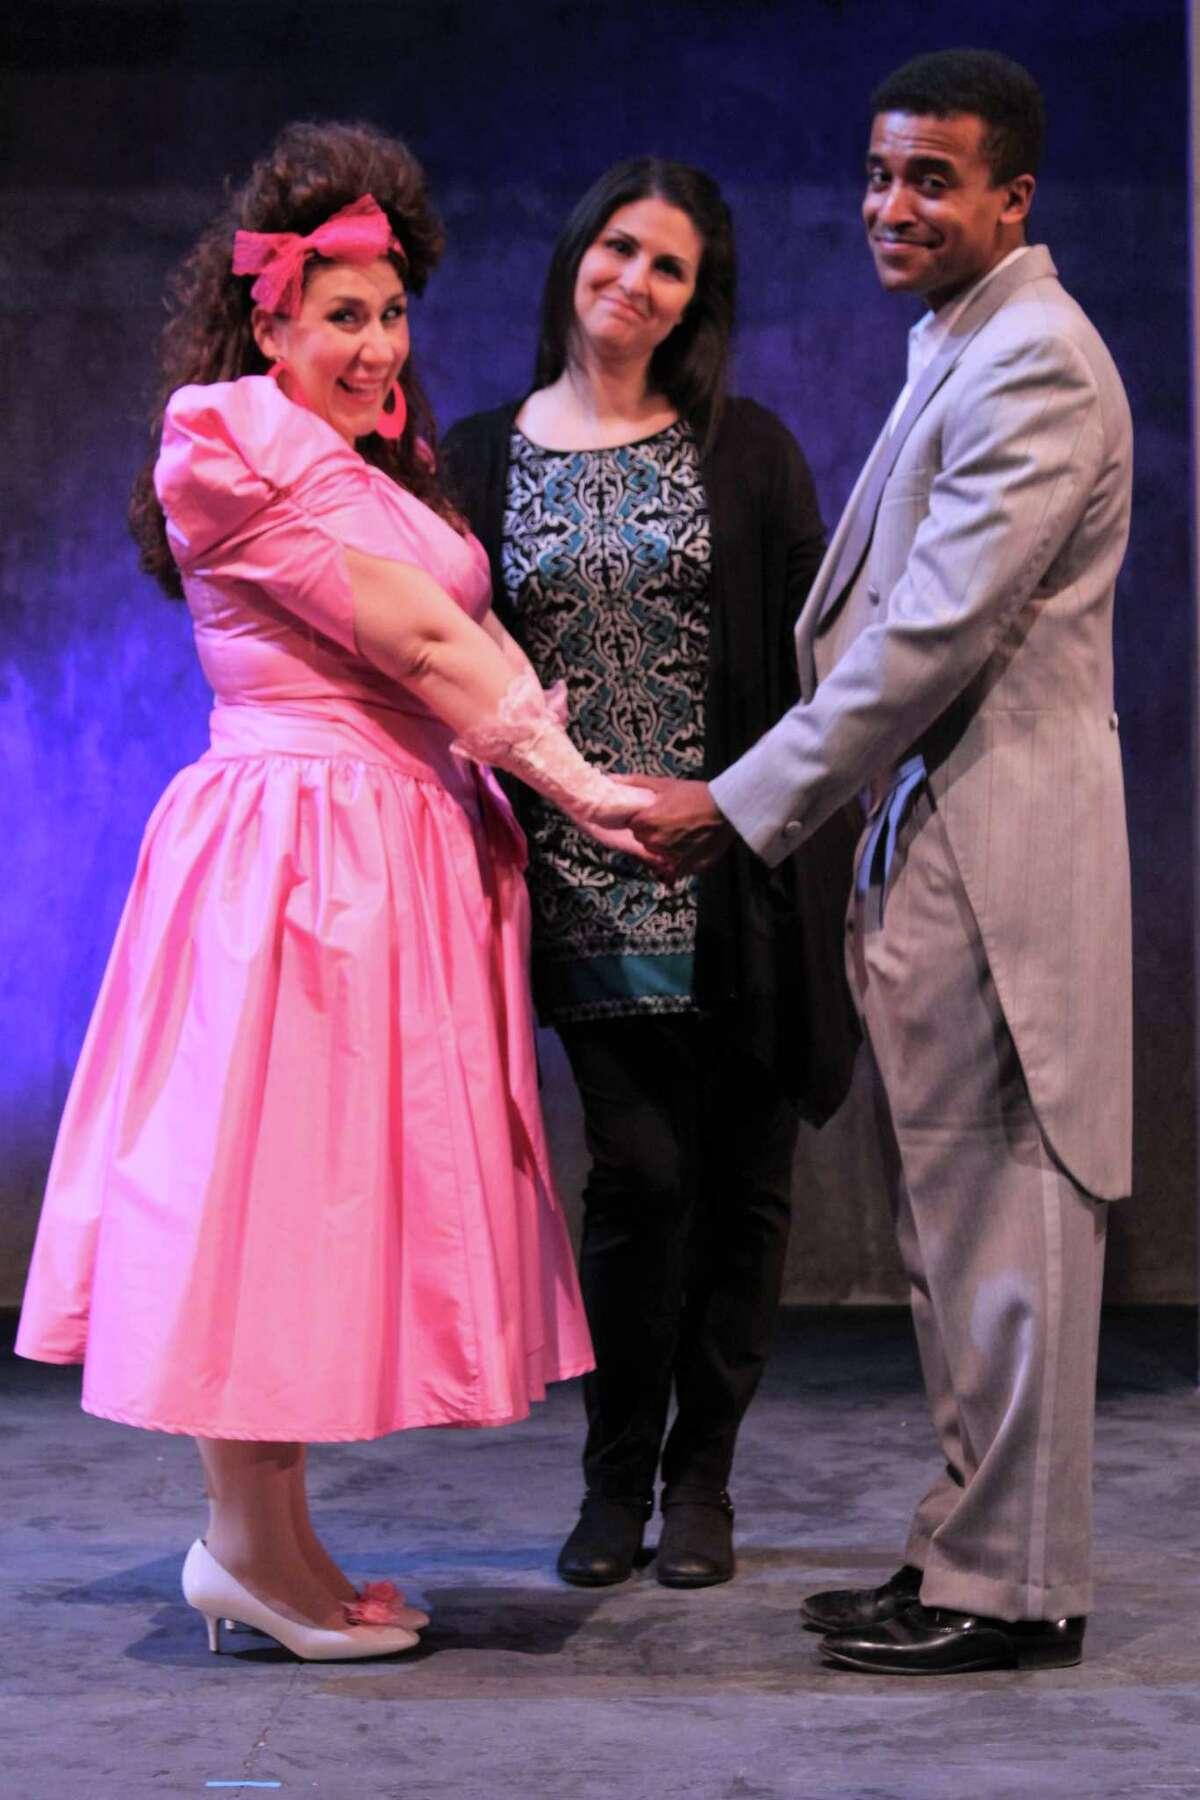 """Love & Spumoni"" is running at Seven Angels Theatre in Waterbury through Feb. 23."